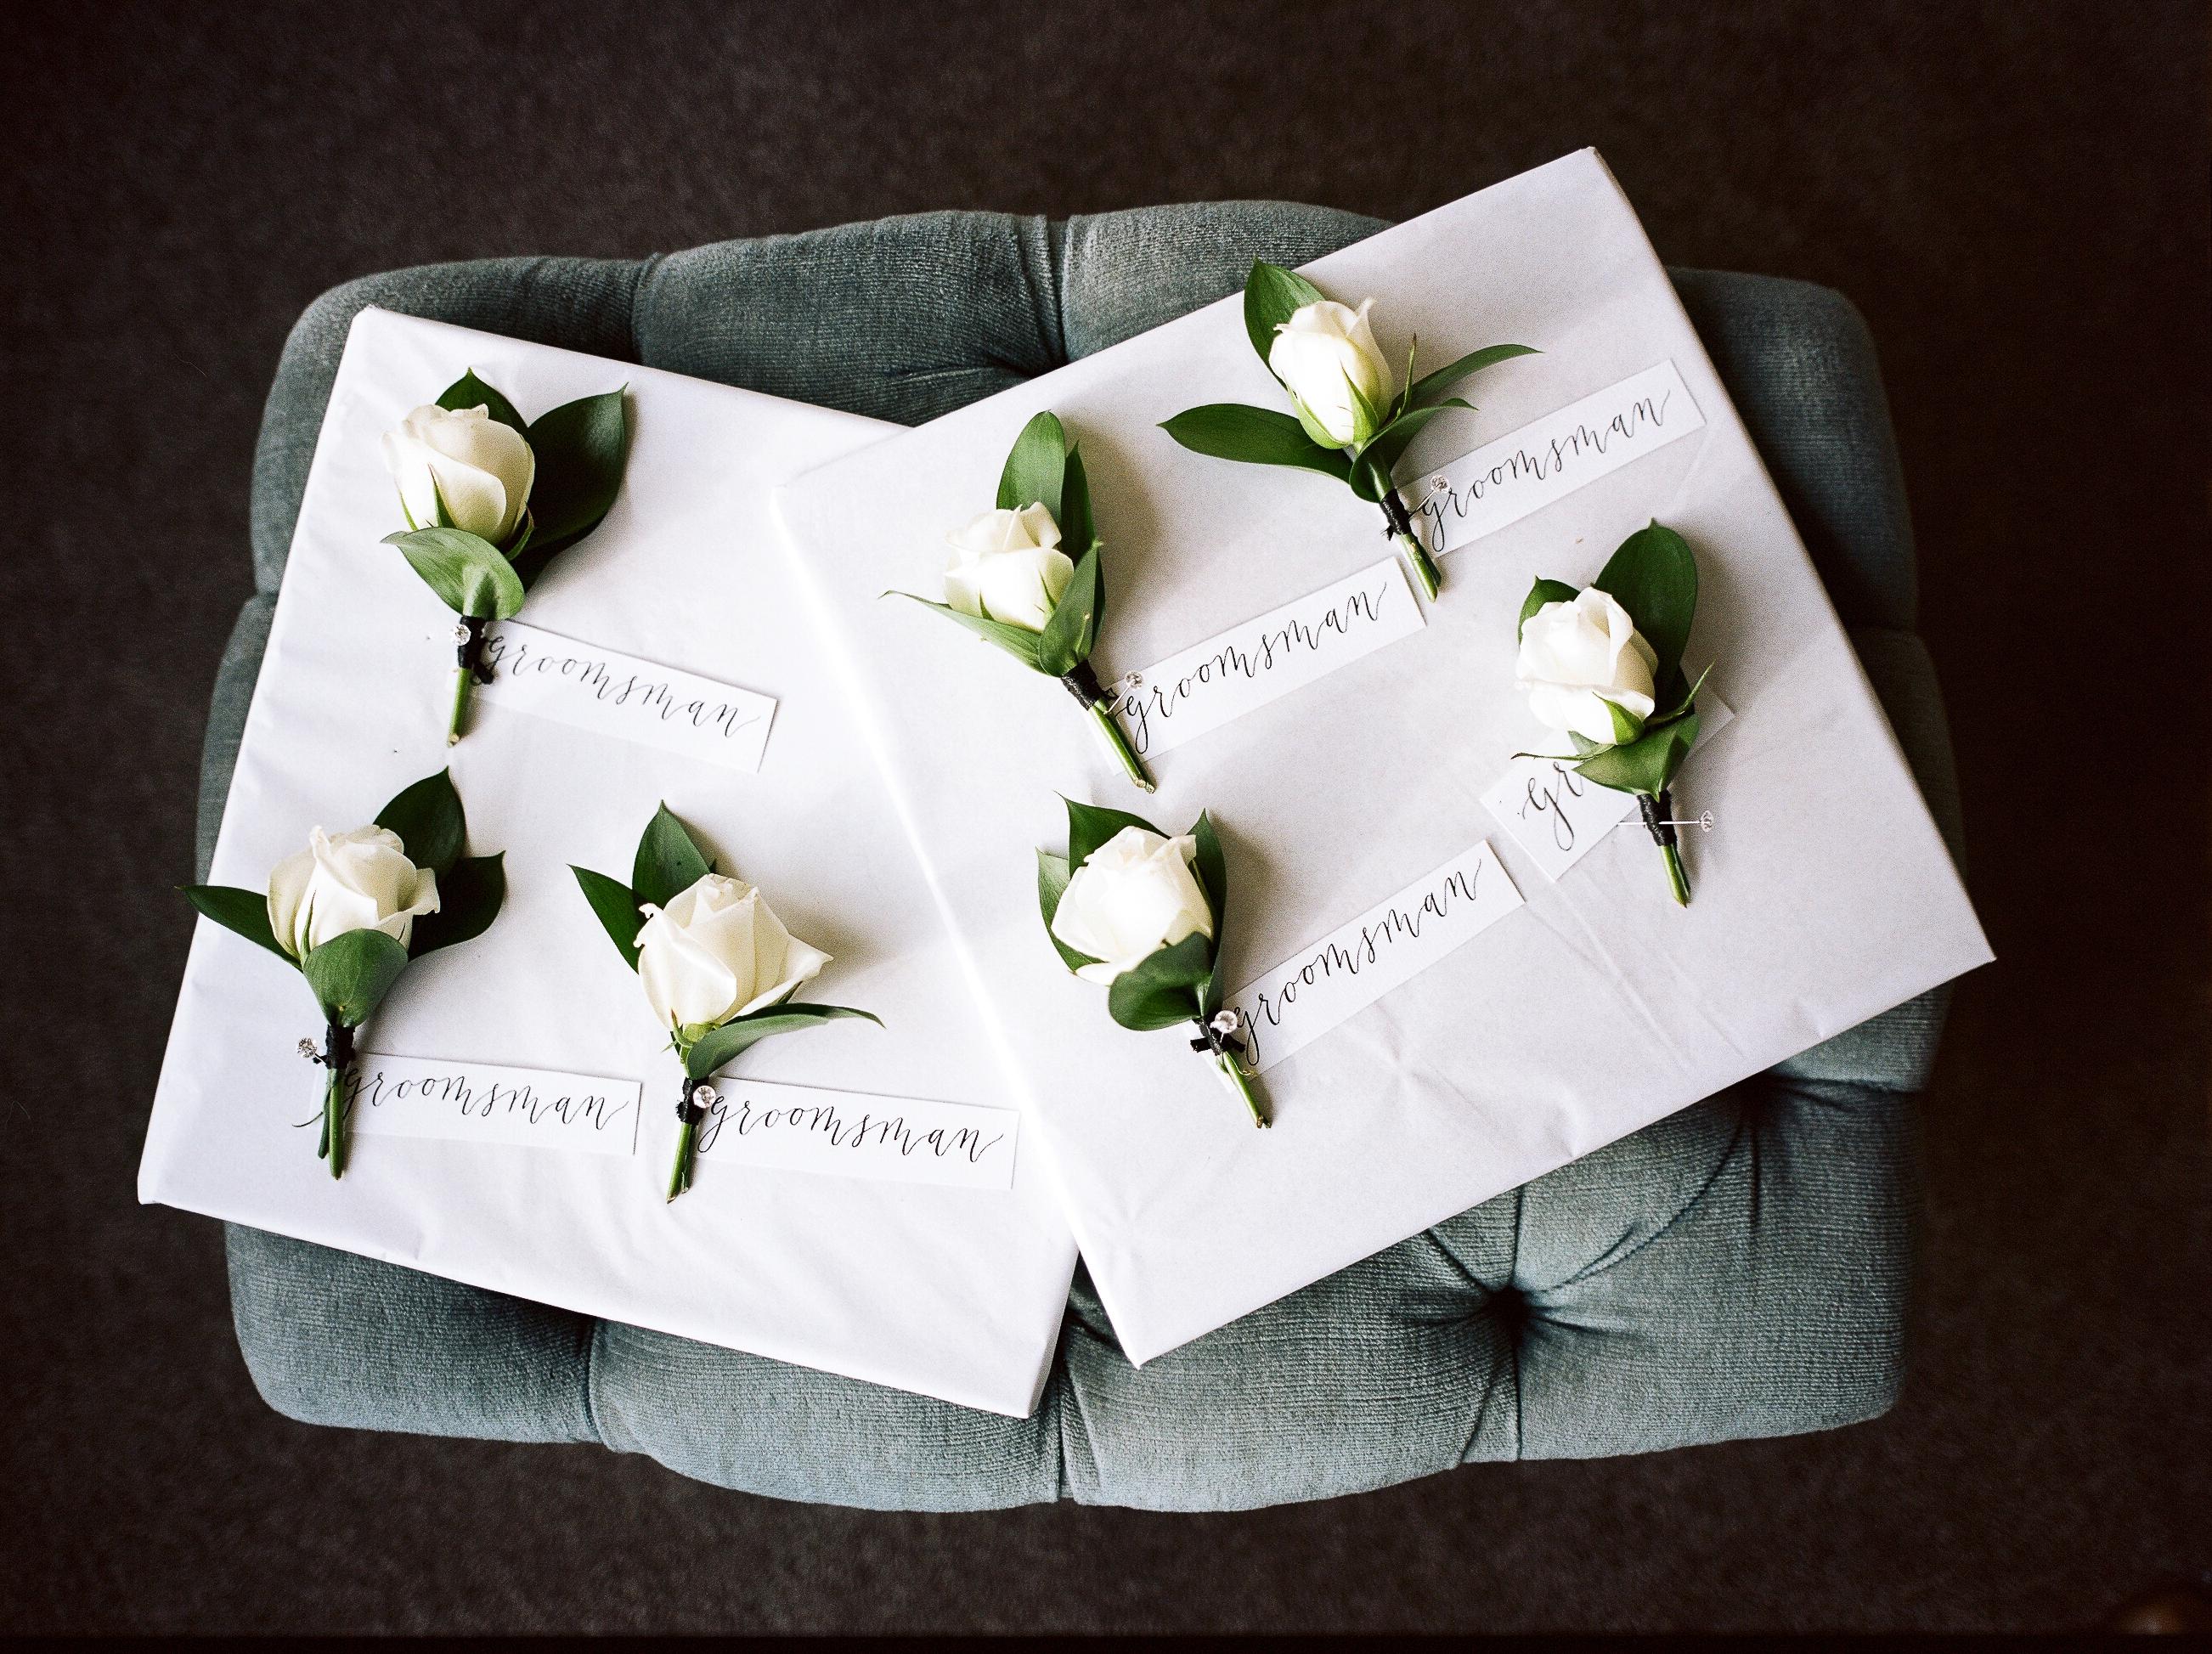 On My Hand Florist - Real wedding portfolio - Katie and Dan buttonholes by Jonny Scott Photography